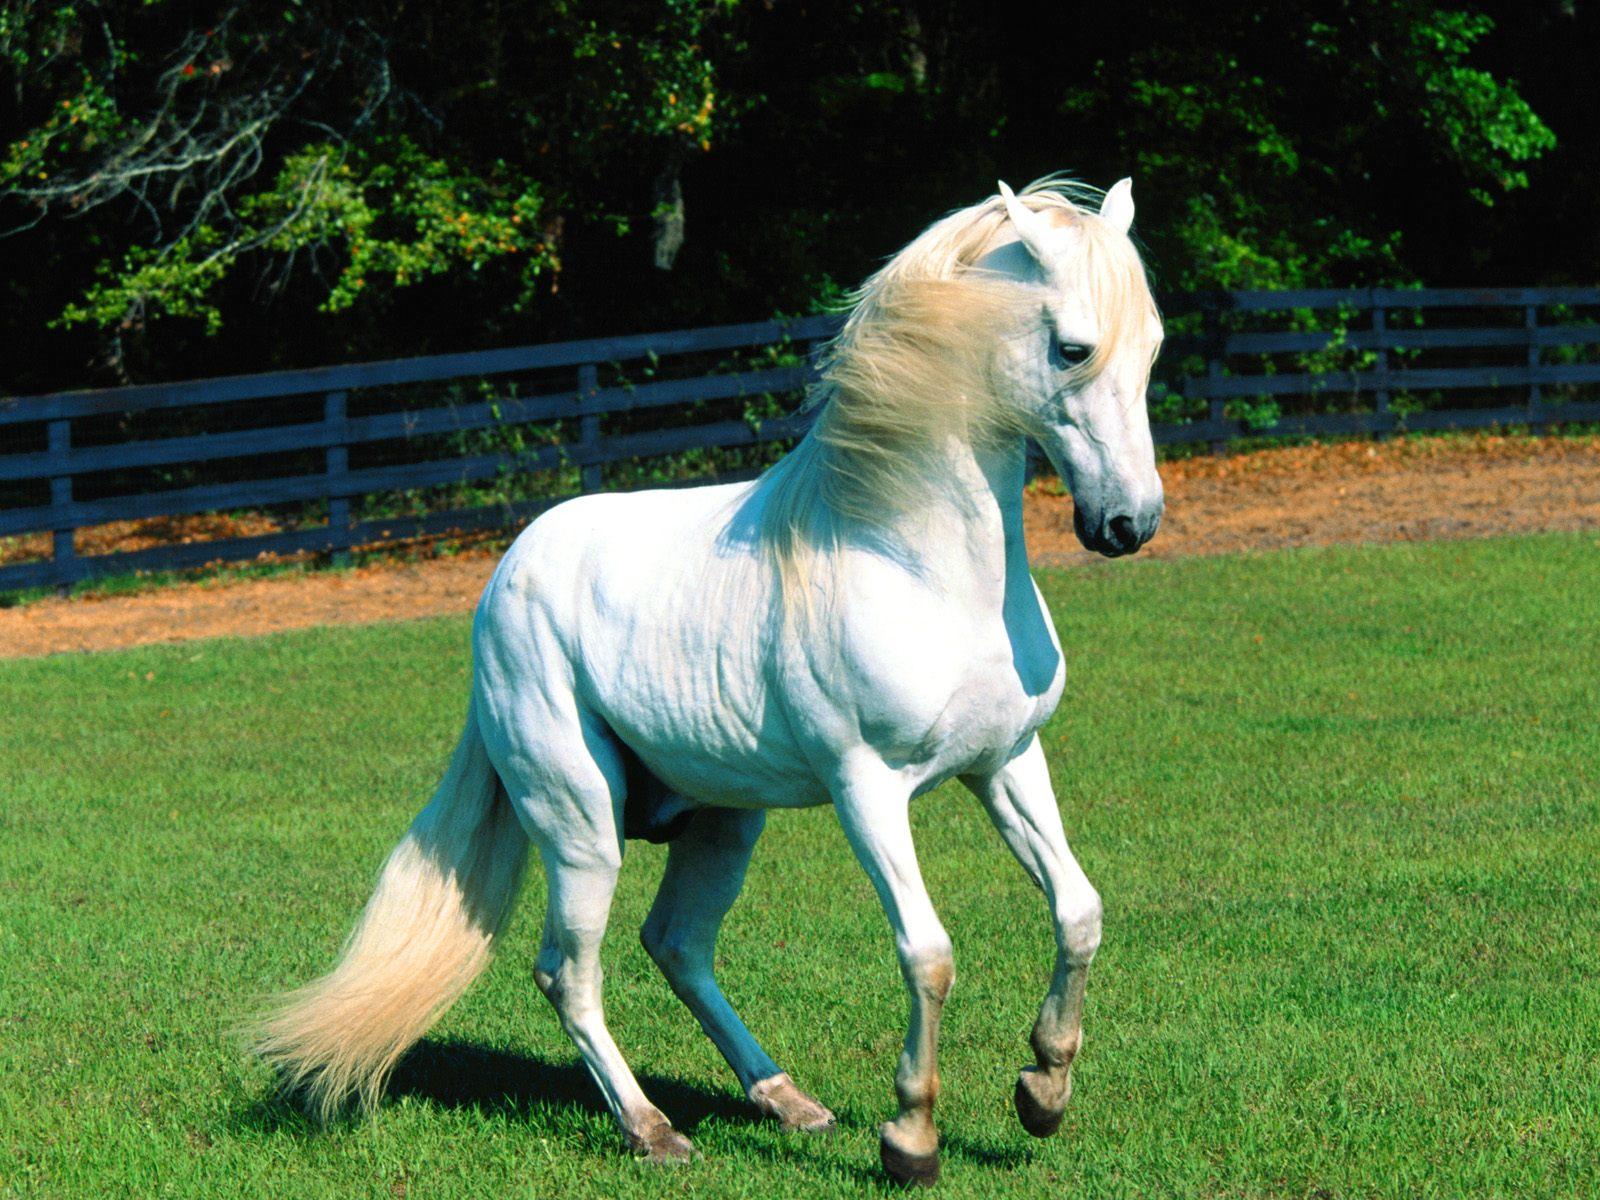 Good   Wallpaper Horse Flicka - MixoPlanet+%2819%29  Image_1285.jpg